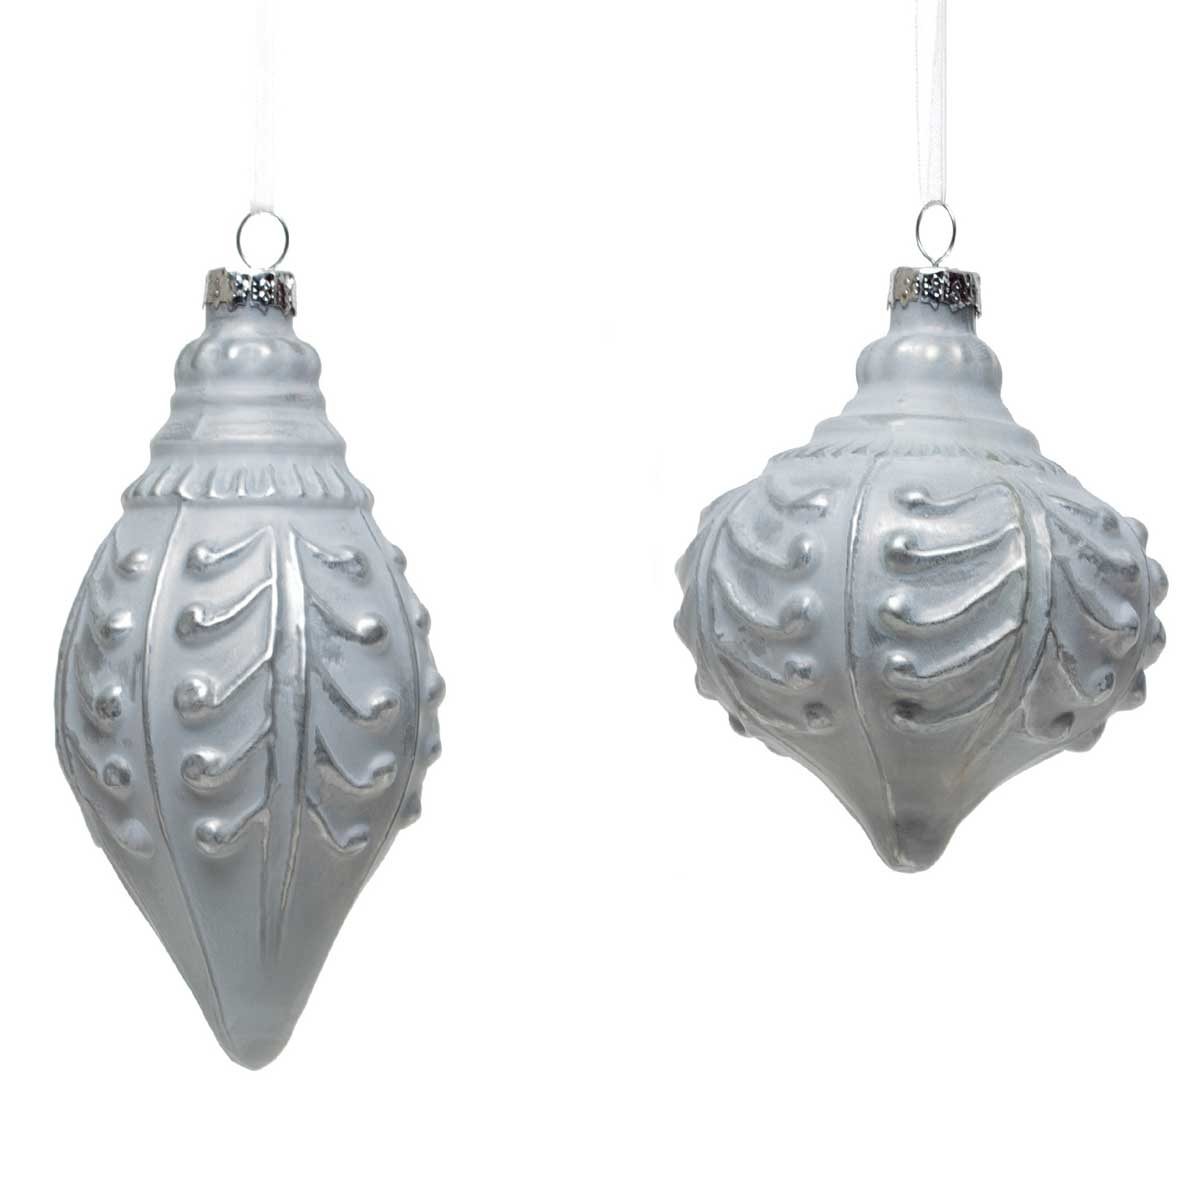 2 Piece Glass Finial/Kismet Ornament Set